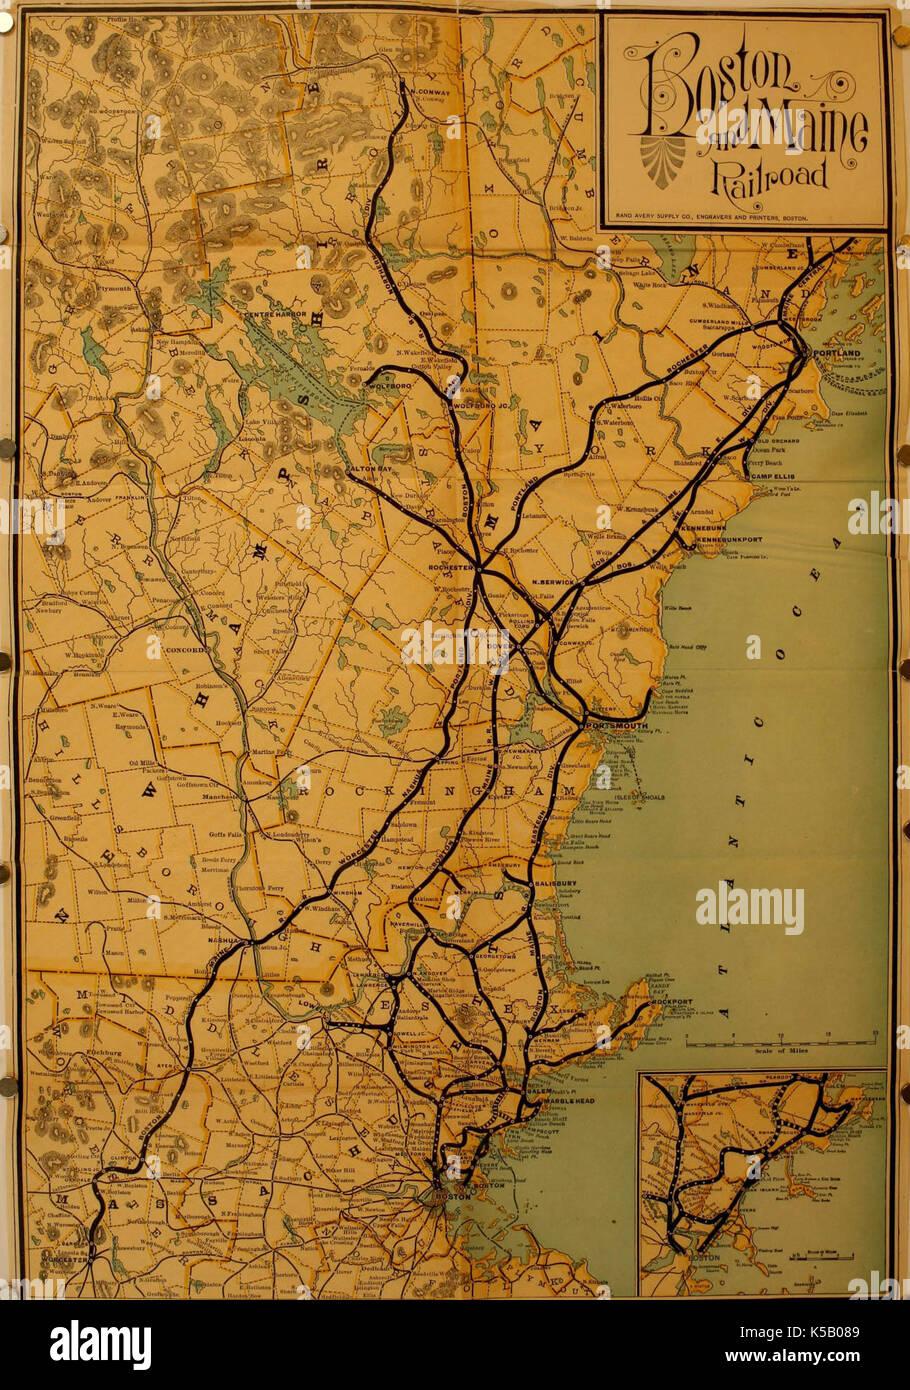 Historische Karte Von Boston Amerika Stockfoto Bild 158208297